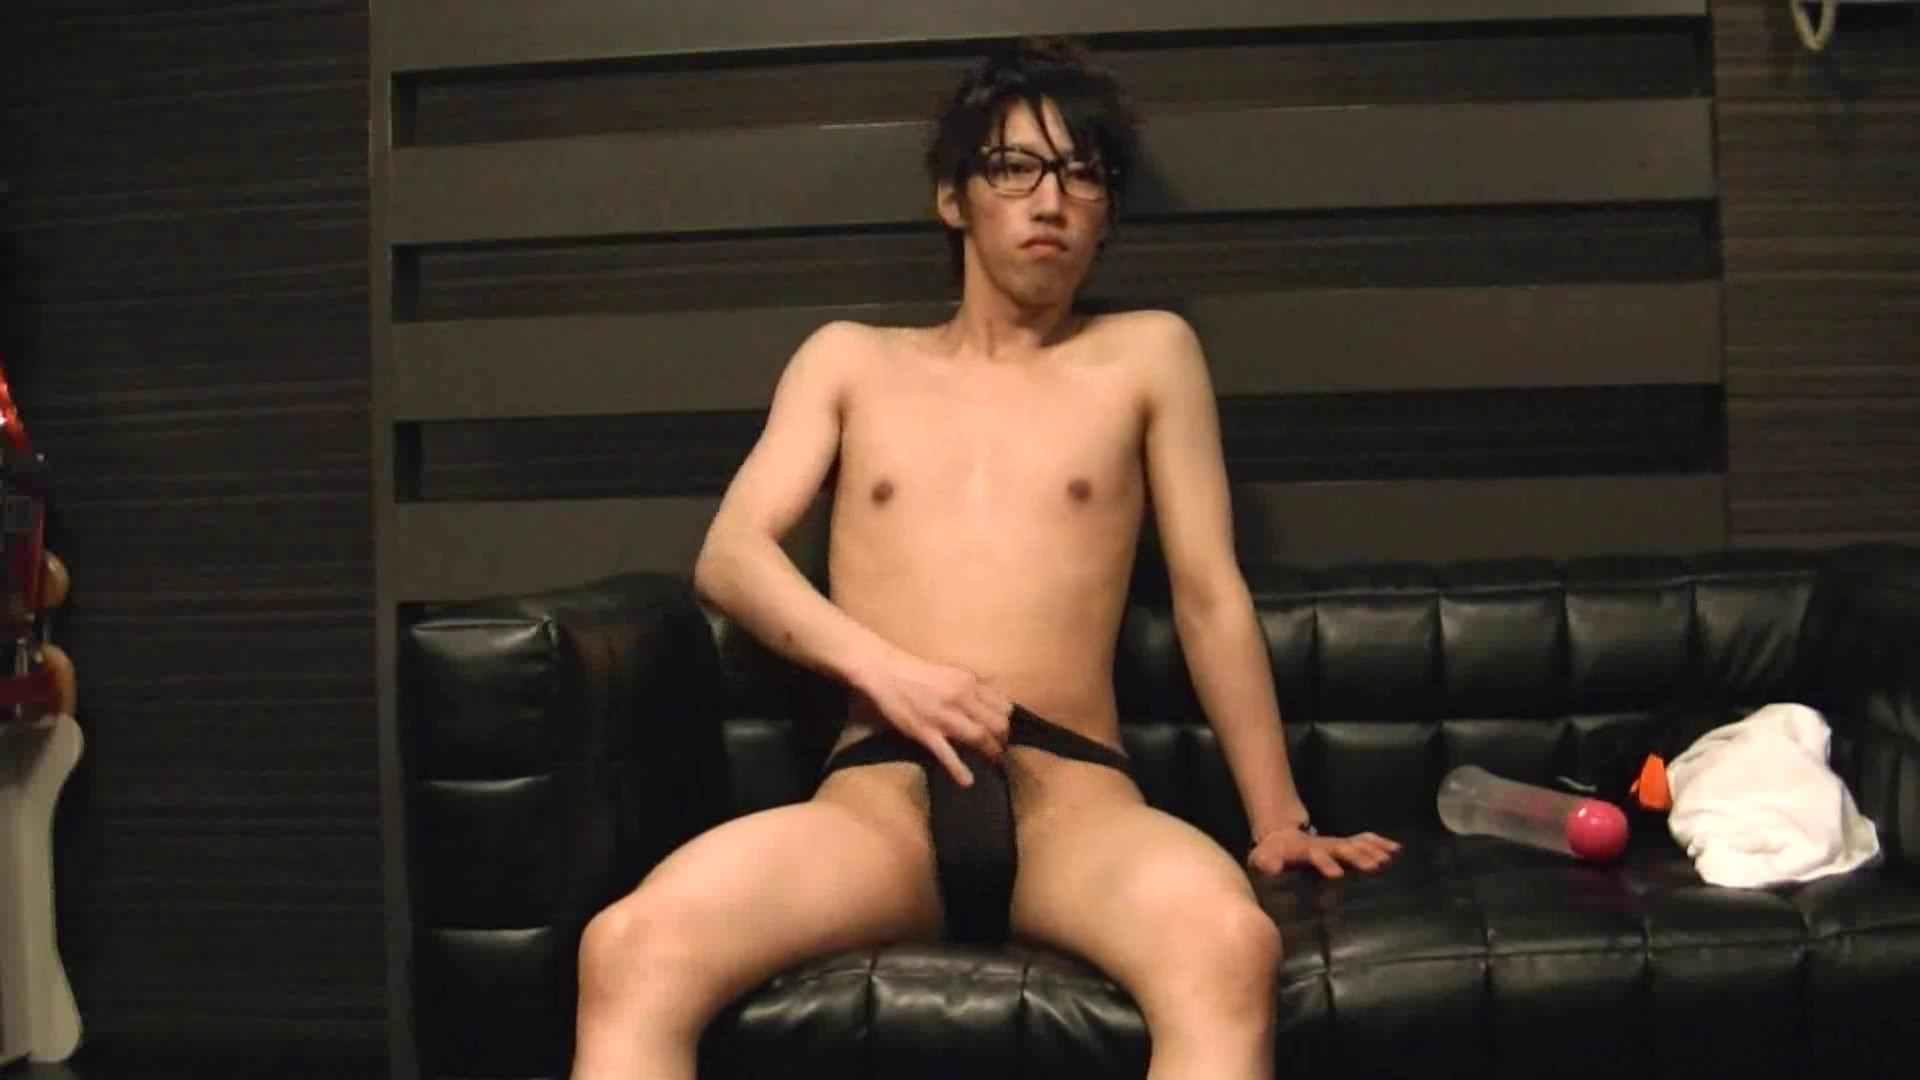 ONA見せカーニバル!! Vol3 男 ゲイ無料無修正画像 89枚 26